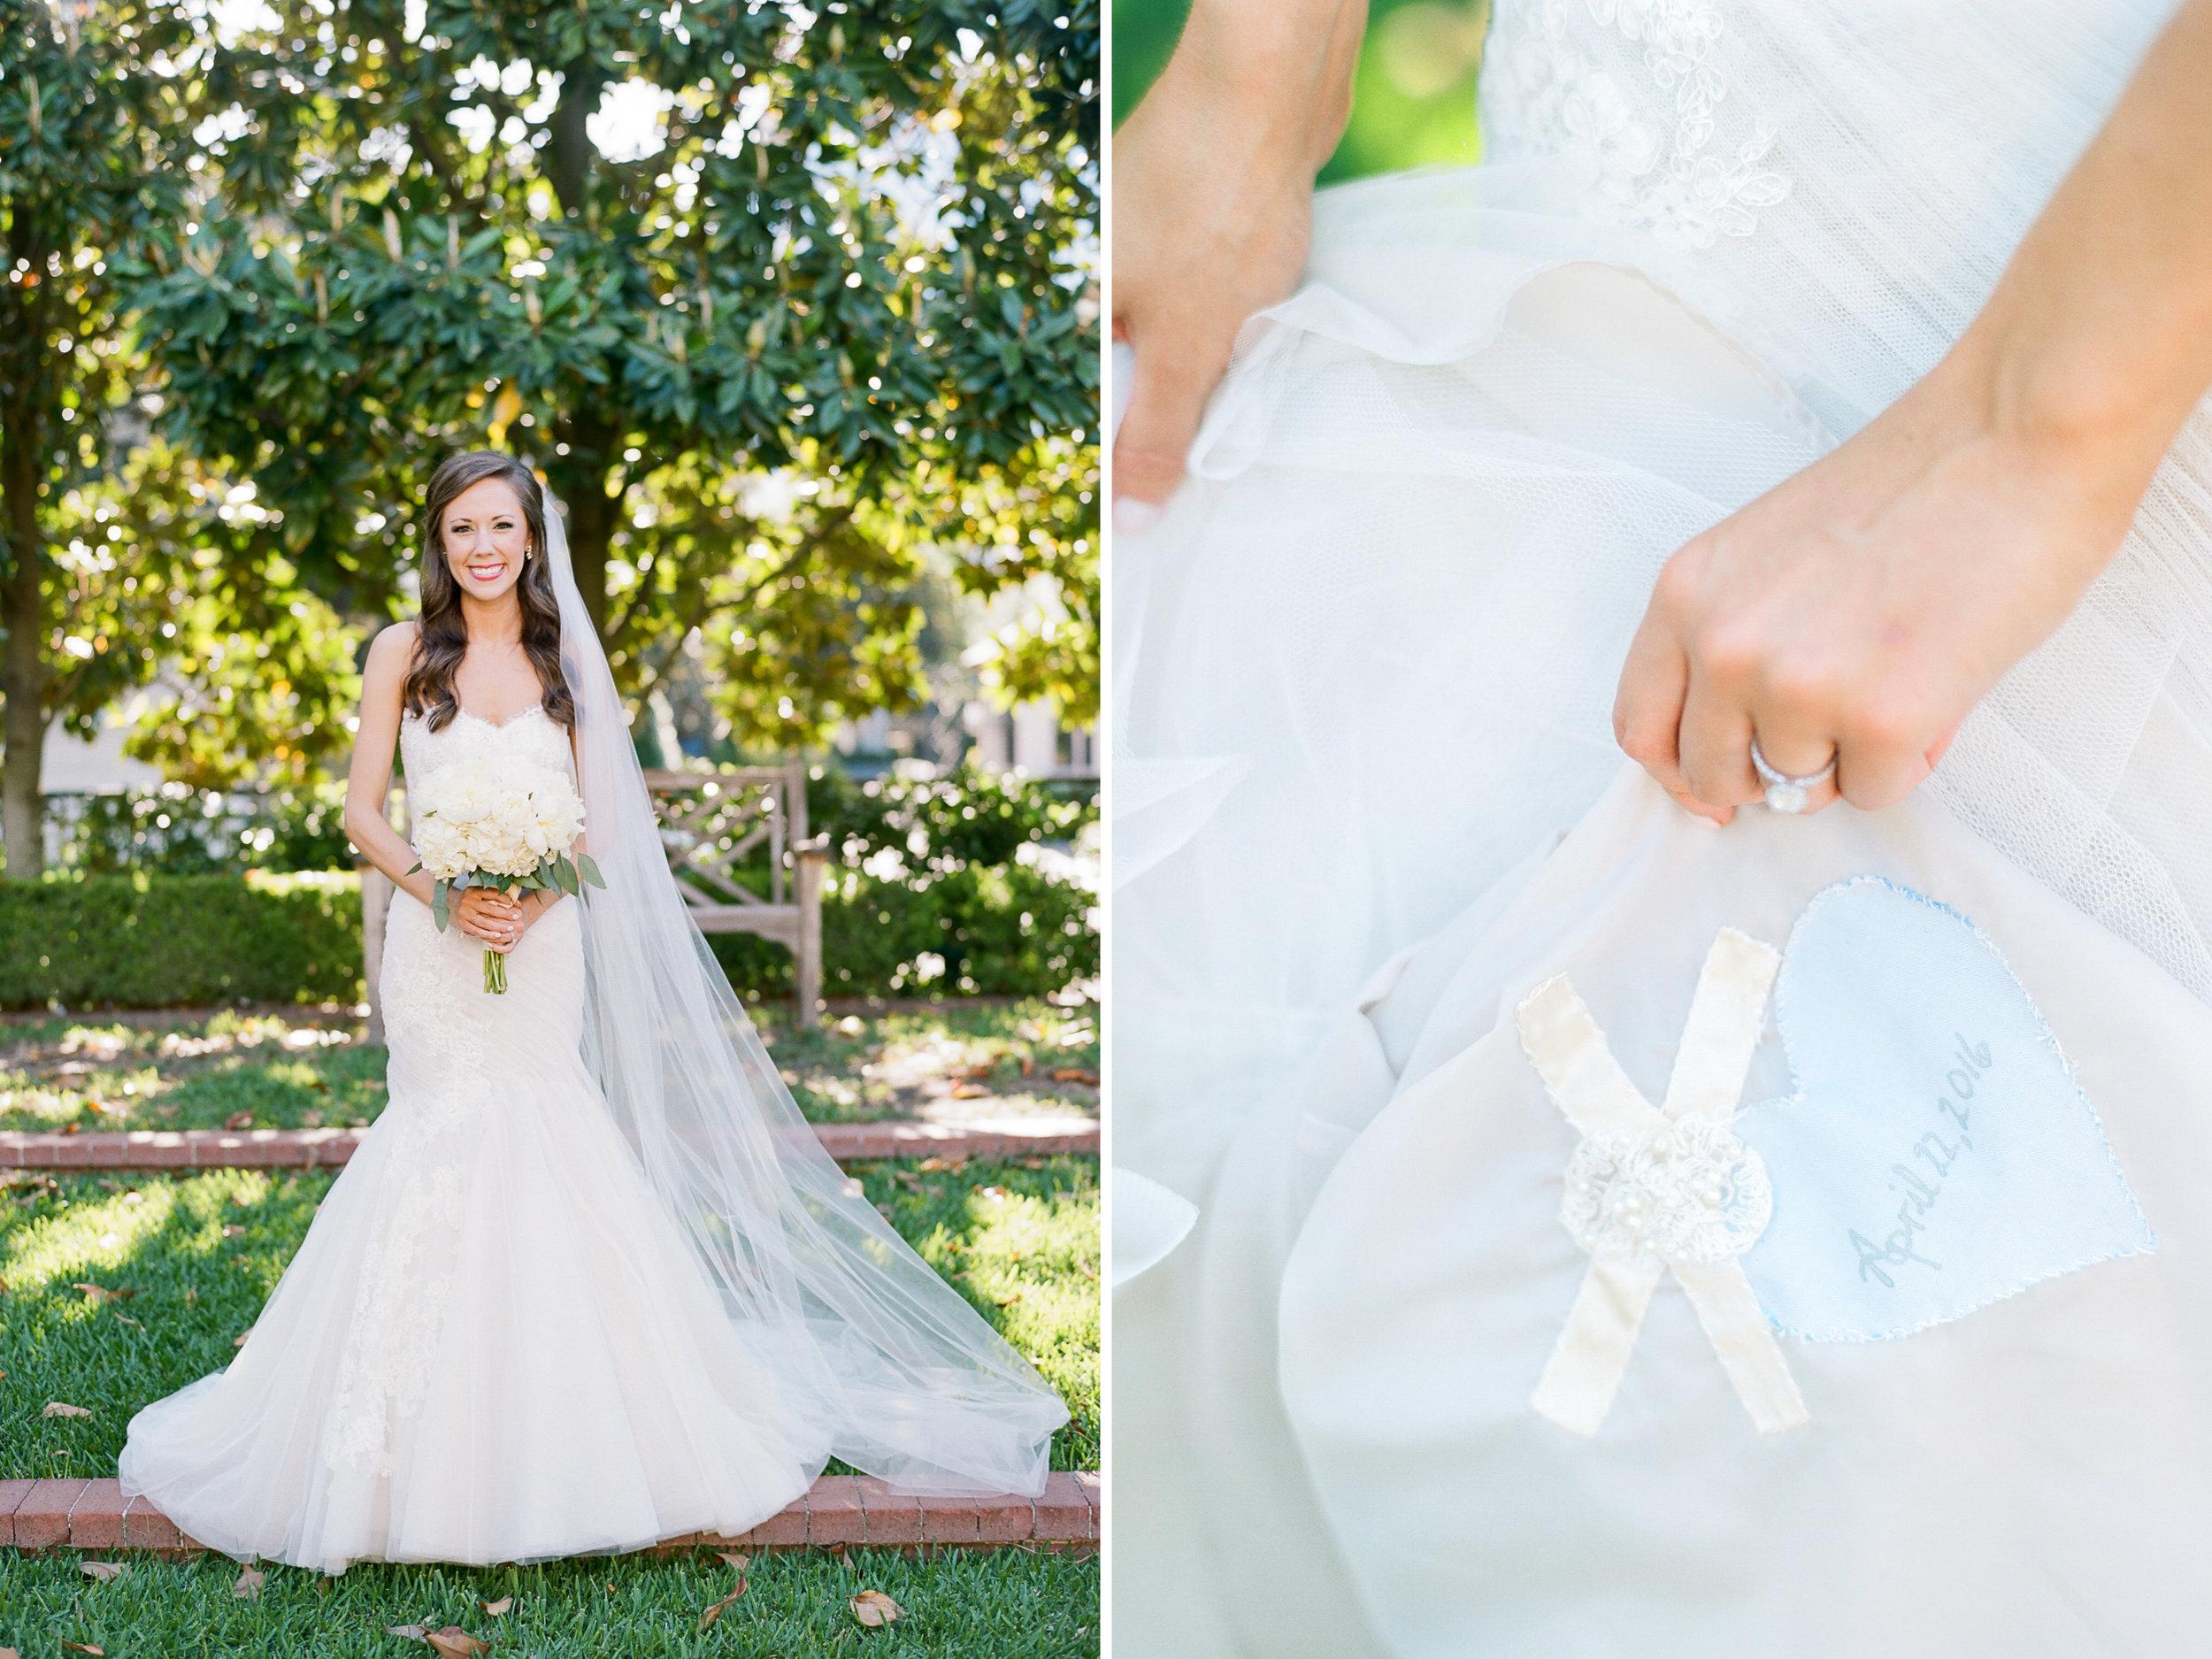 St.-Philip-Presbyterian-Church-Houston-Wedding-Ceremony-The-Junior-League-Of-Houston-Reception-Dana-Fernandez-Photography-Fine-Art-Film-110.jpg